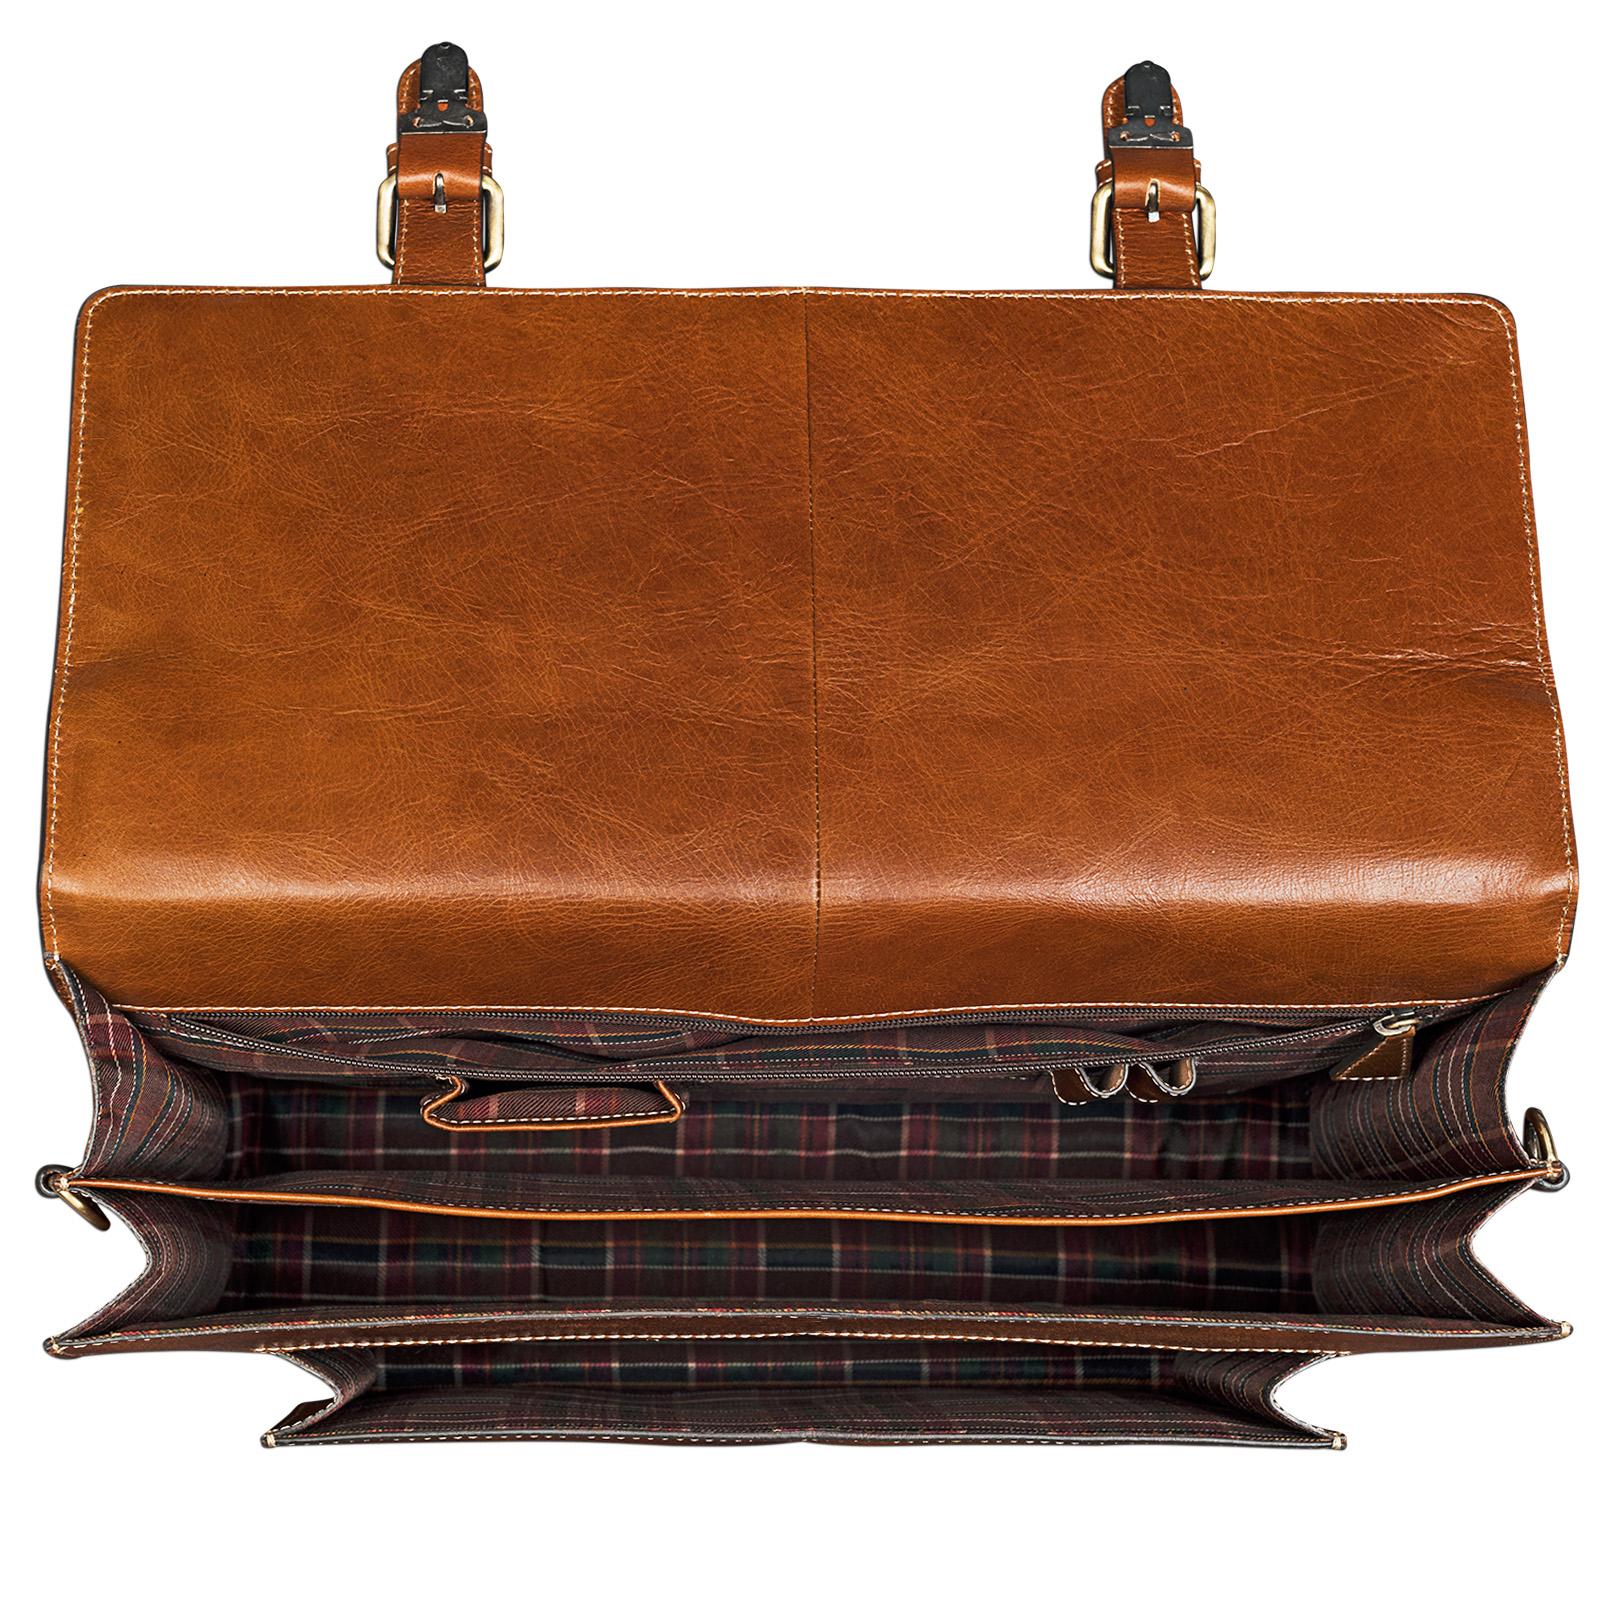 "STILORD ""Lorenz"" Vintage Aktentasche Leder groß Herren Damen Lehrer Business Bürotasche 15,6 Zoll DIN A4 echtes Leder cognac / braun - Bild 3"